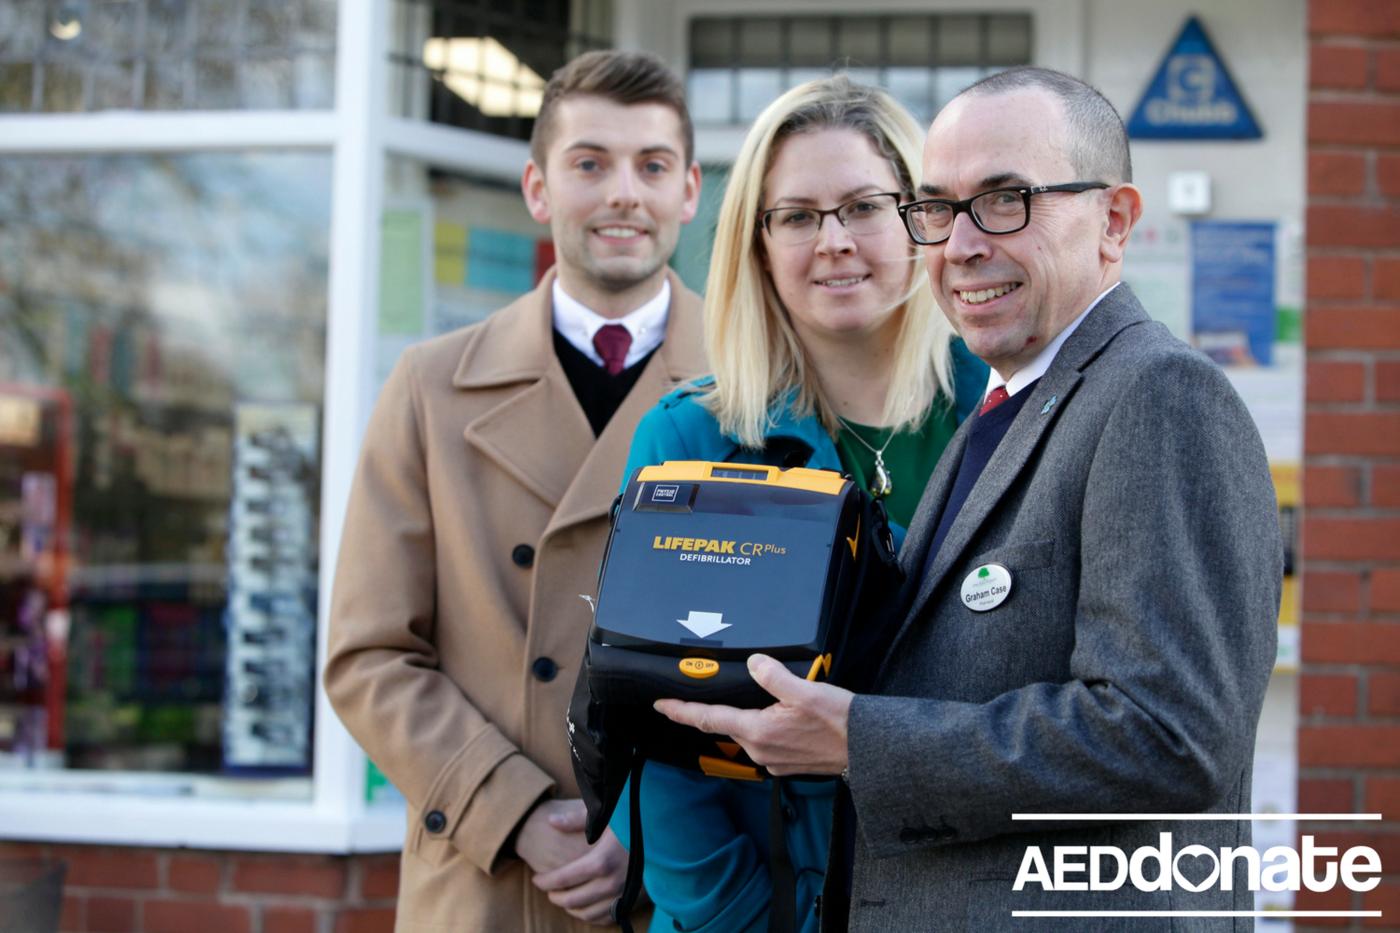 Defibrillator installed in Tettenhall in memory of Alex